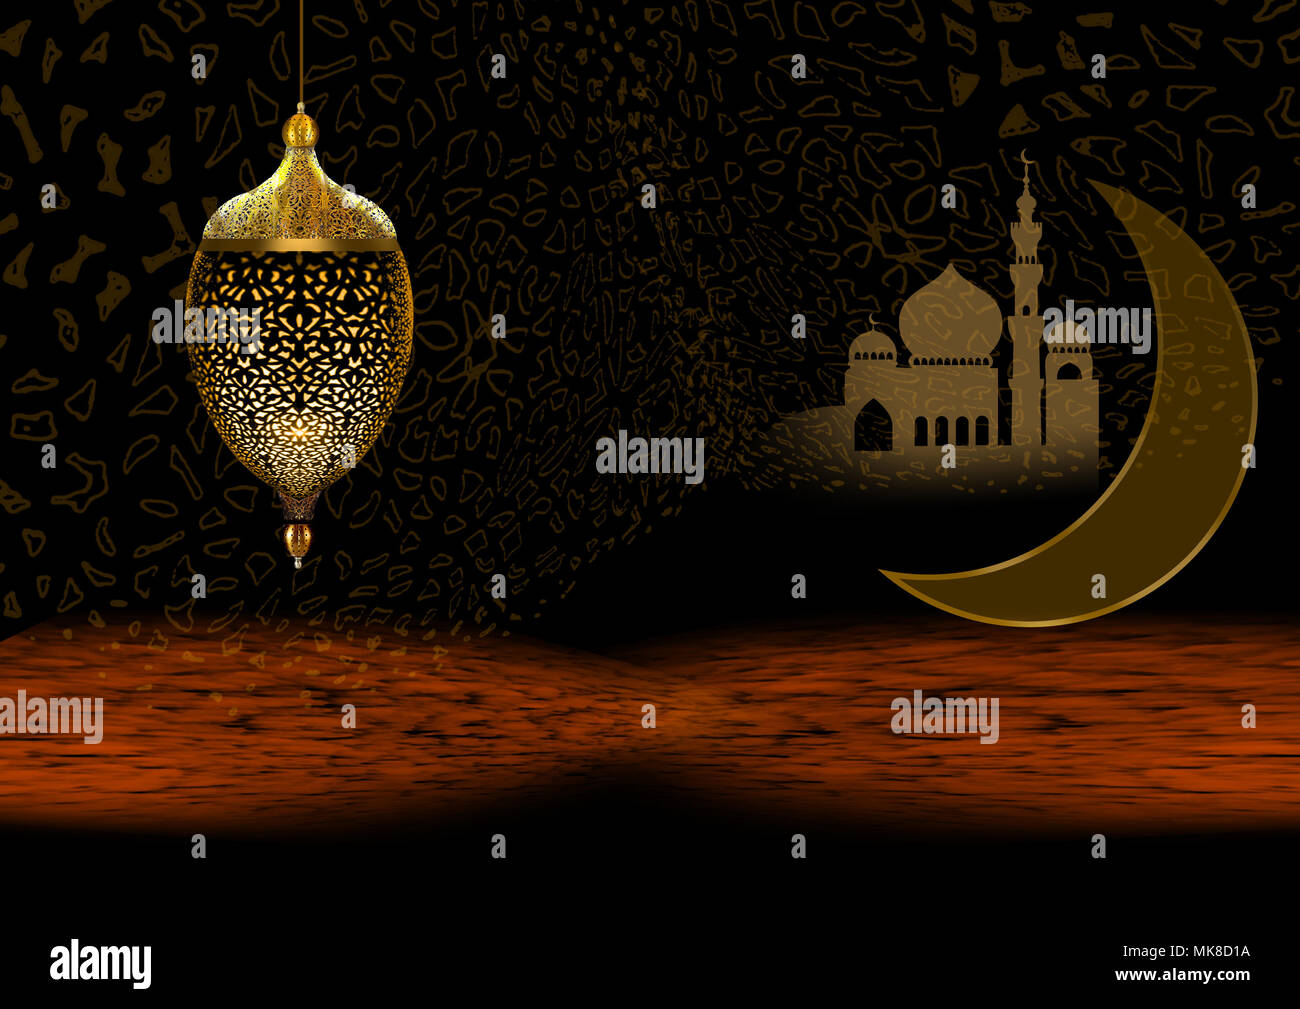 Ramadan greeting card stock photos ramadan greeting card stock ramadan greeting card stock image m4hsunfo